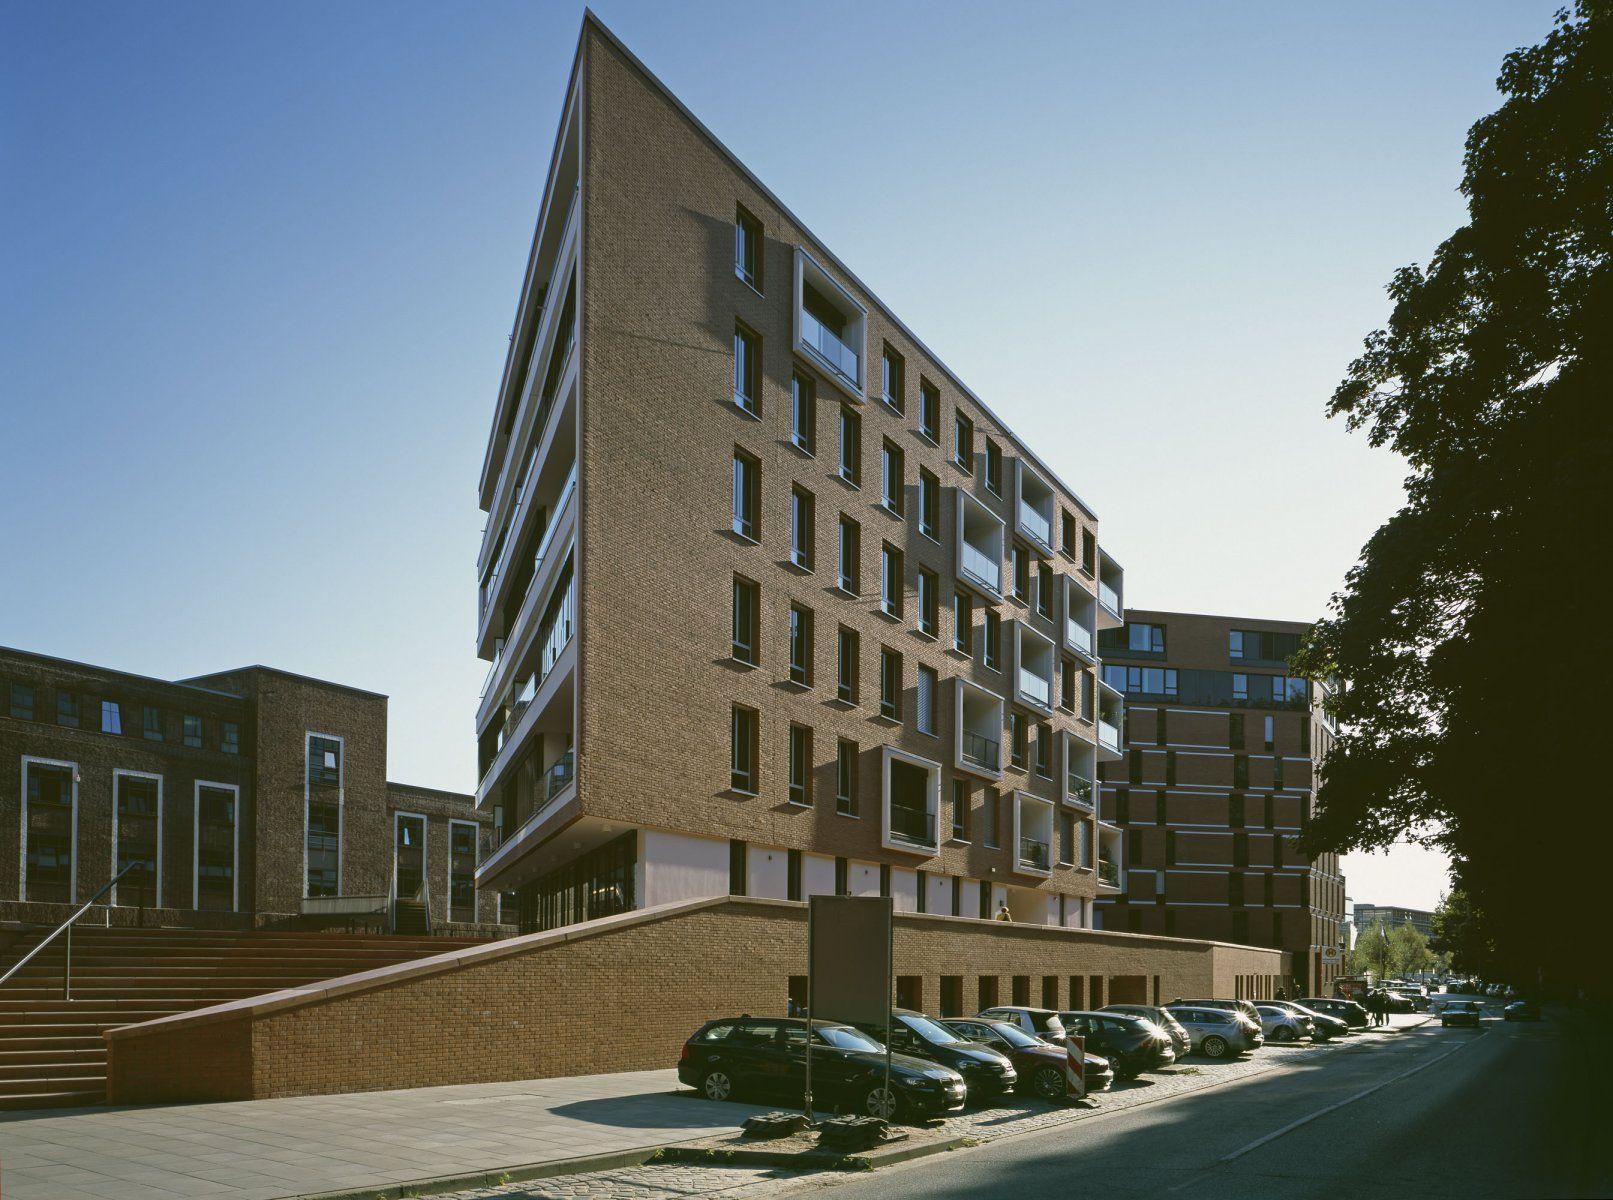 Architekt Hamburg elbdeck hamburg carsten roth architekt arq prédios